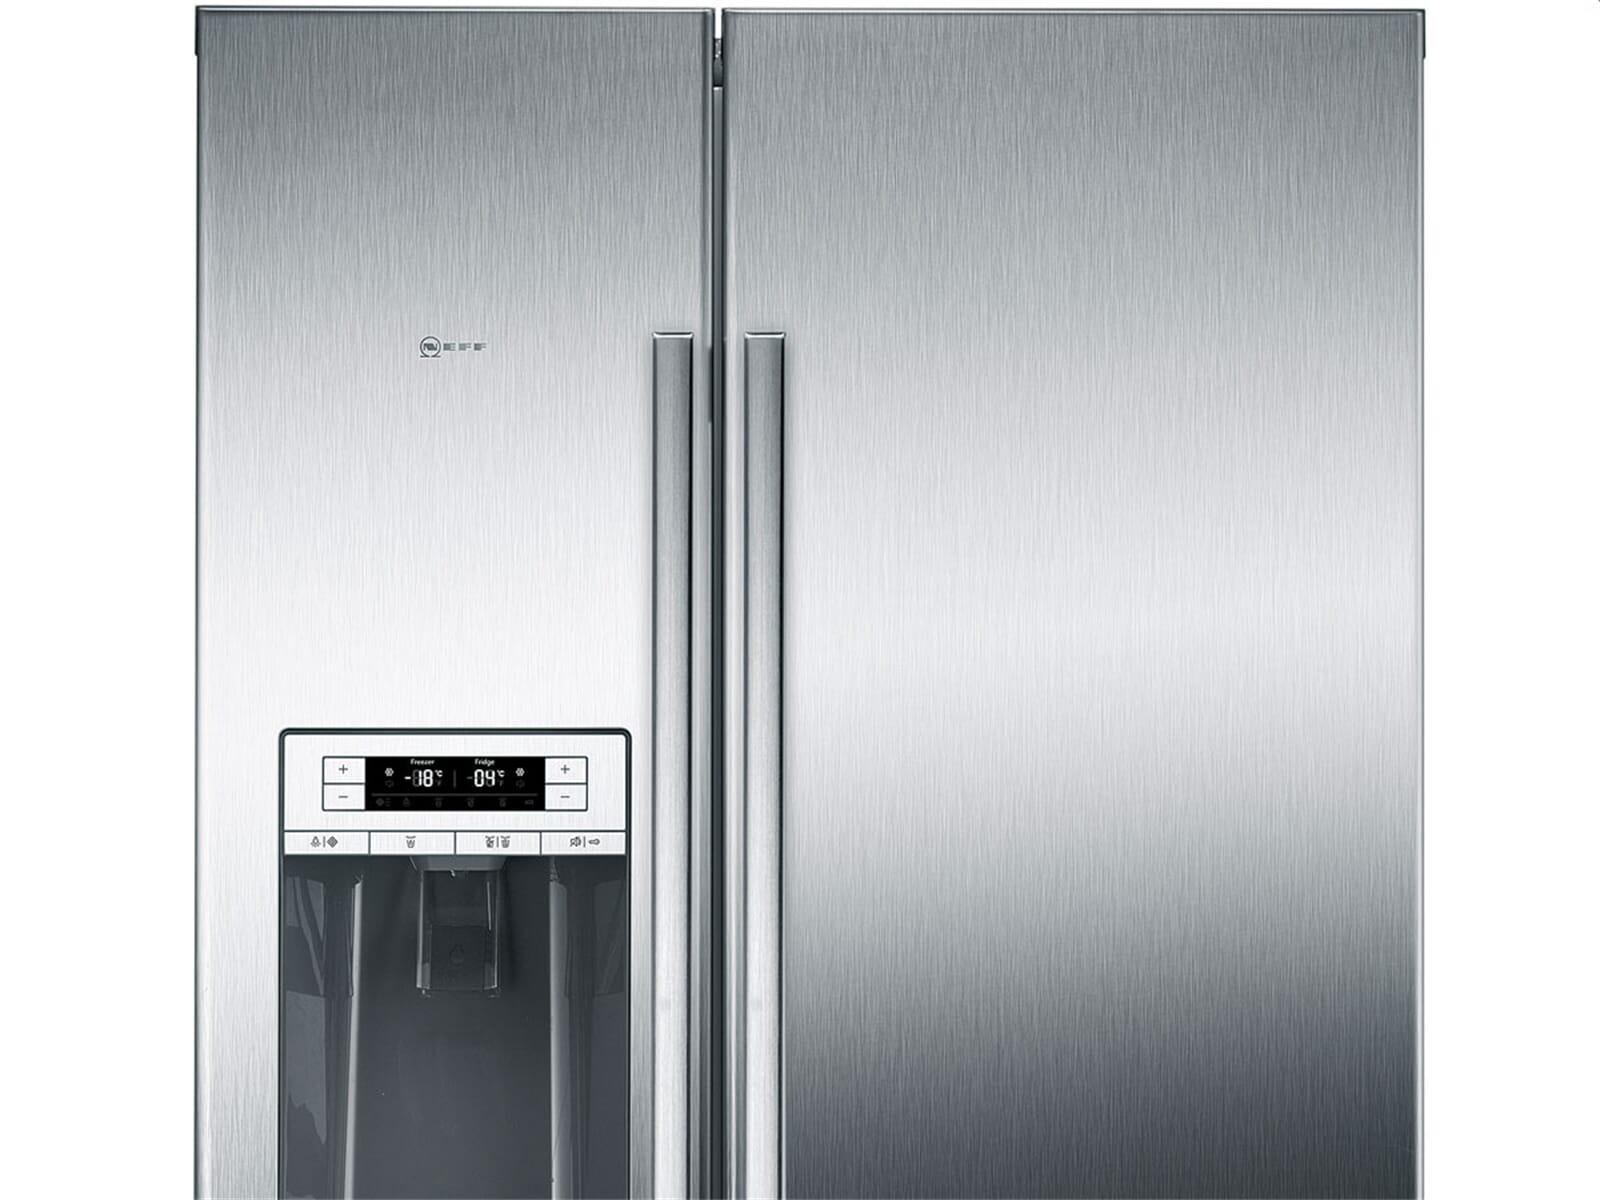 Neff Amerikanischer Kühlschrank Edelstahl : Neff ksa 788 a1 side by side kühl gefrier kombination edelstahl